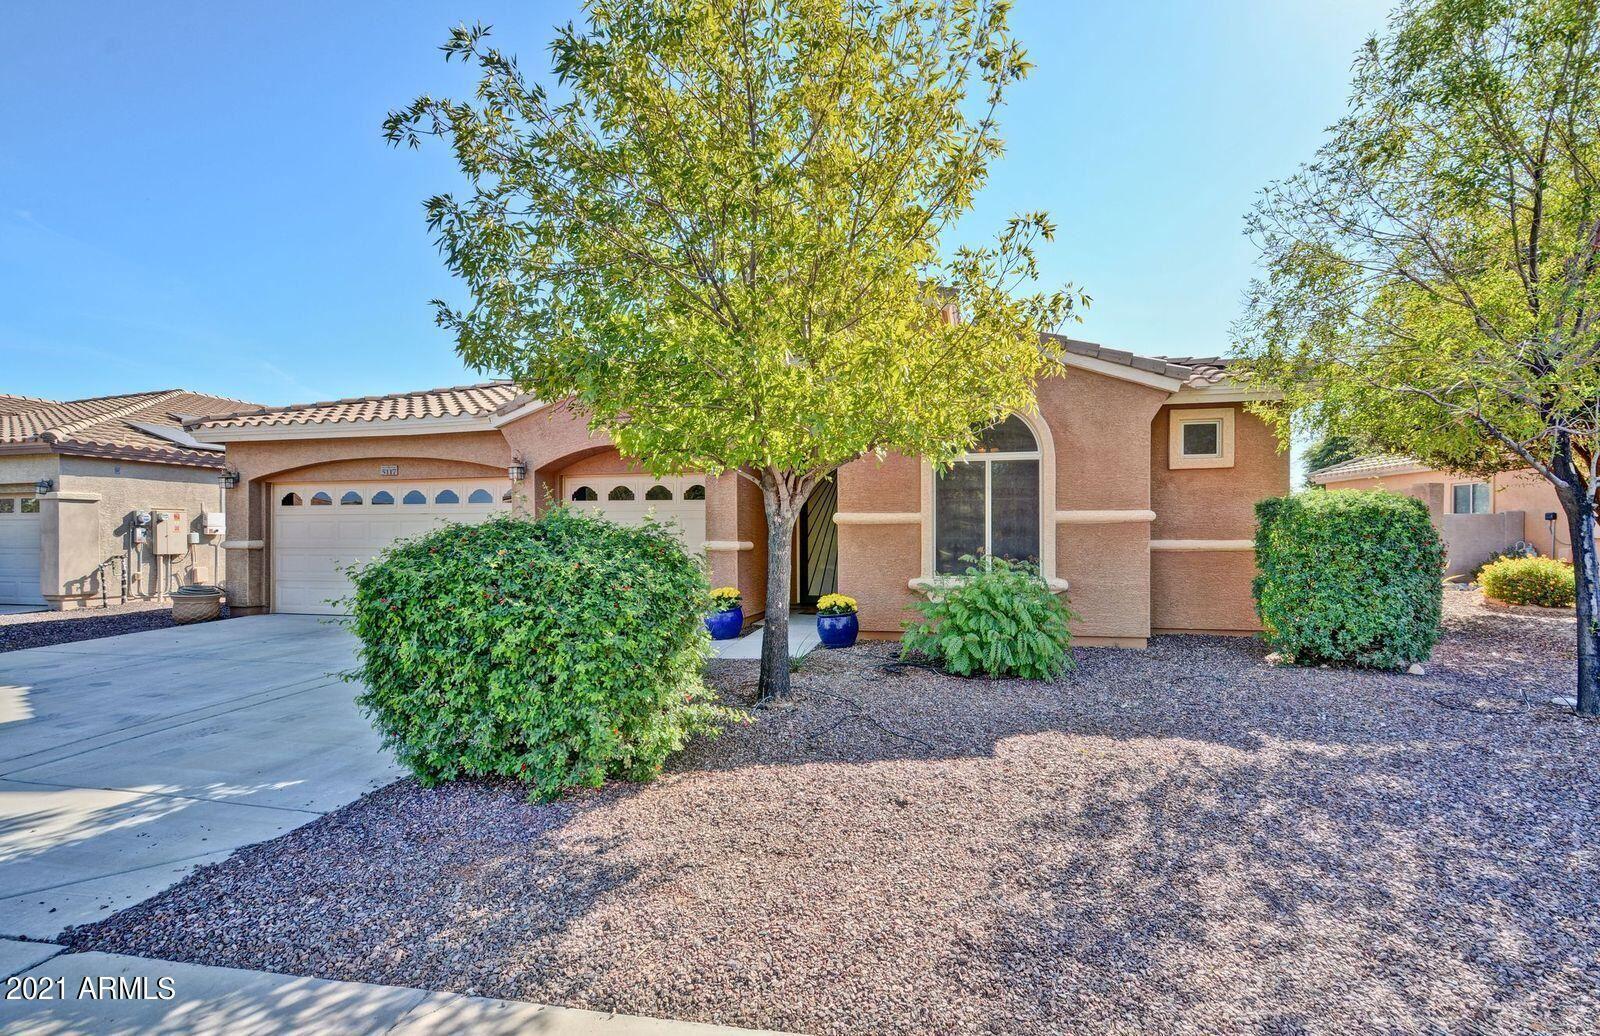 Photo of 5117 N 193RD Drive, Litchfield Park, AZ 85340 (MLS # 6311054)